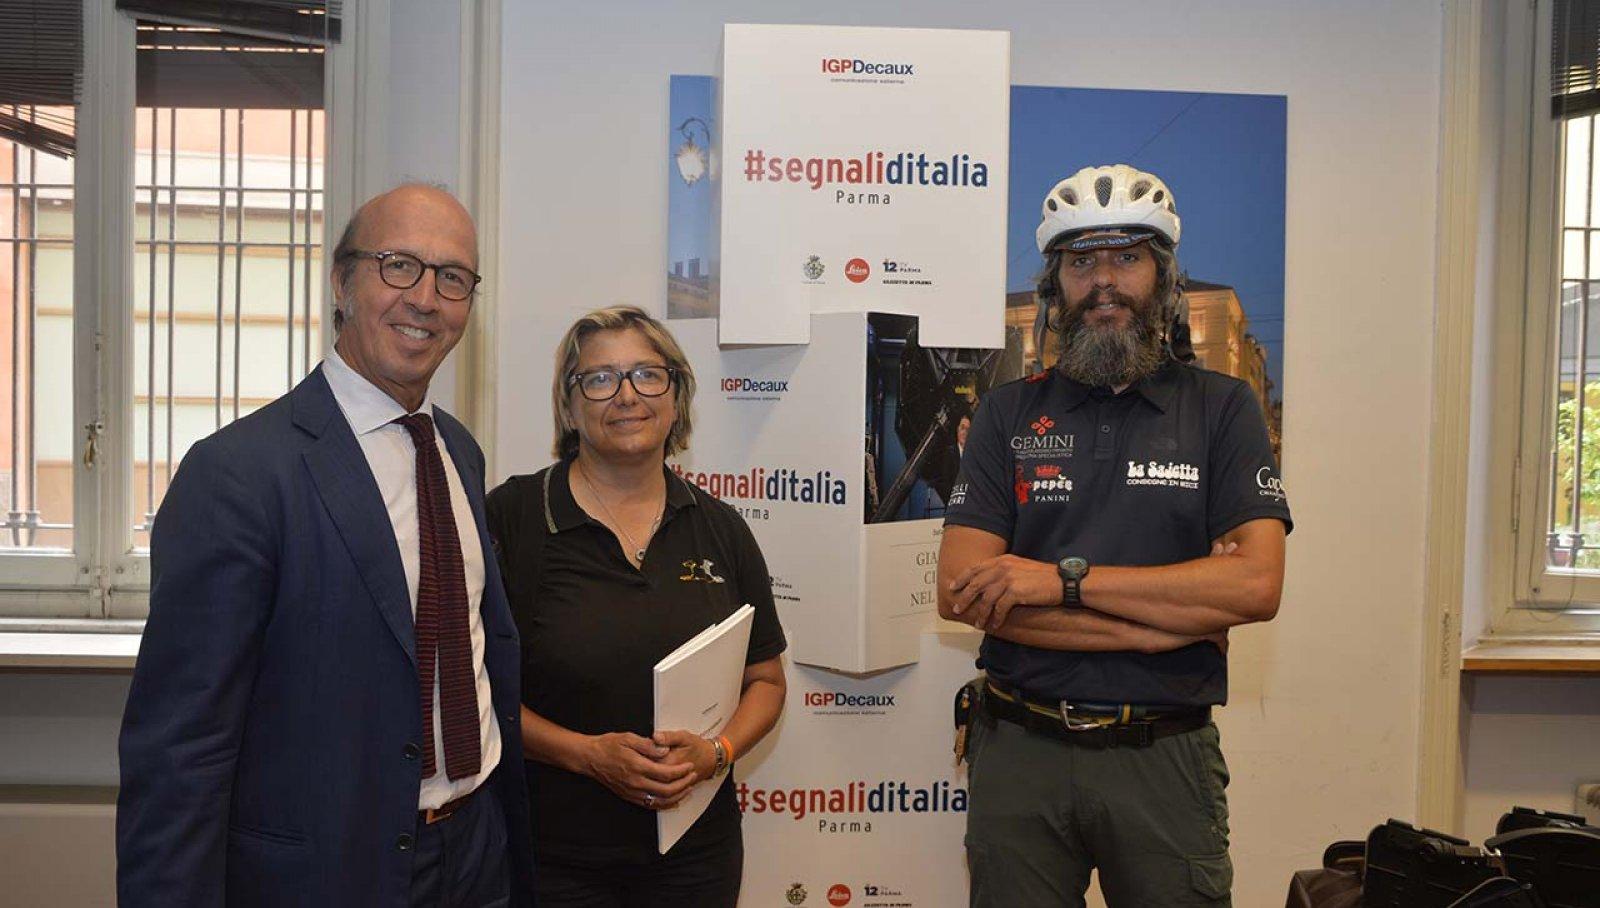 Campagna_Segnali_D'Italia_IGPDecaux2018_Parma